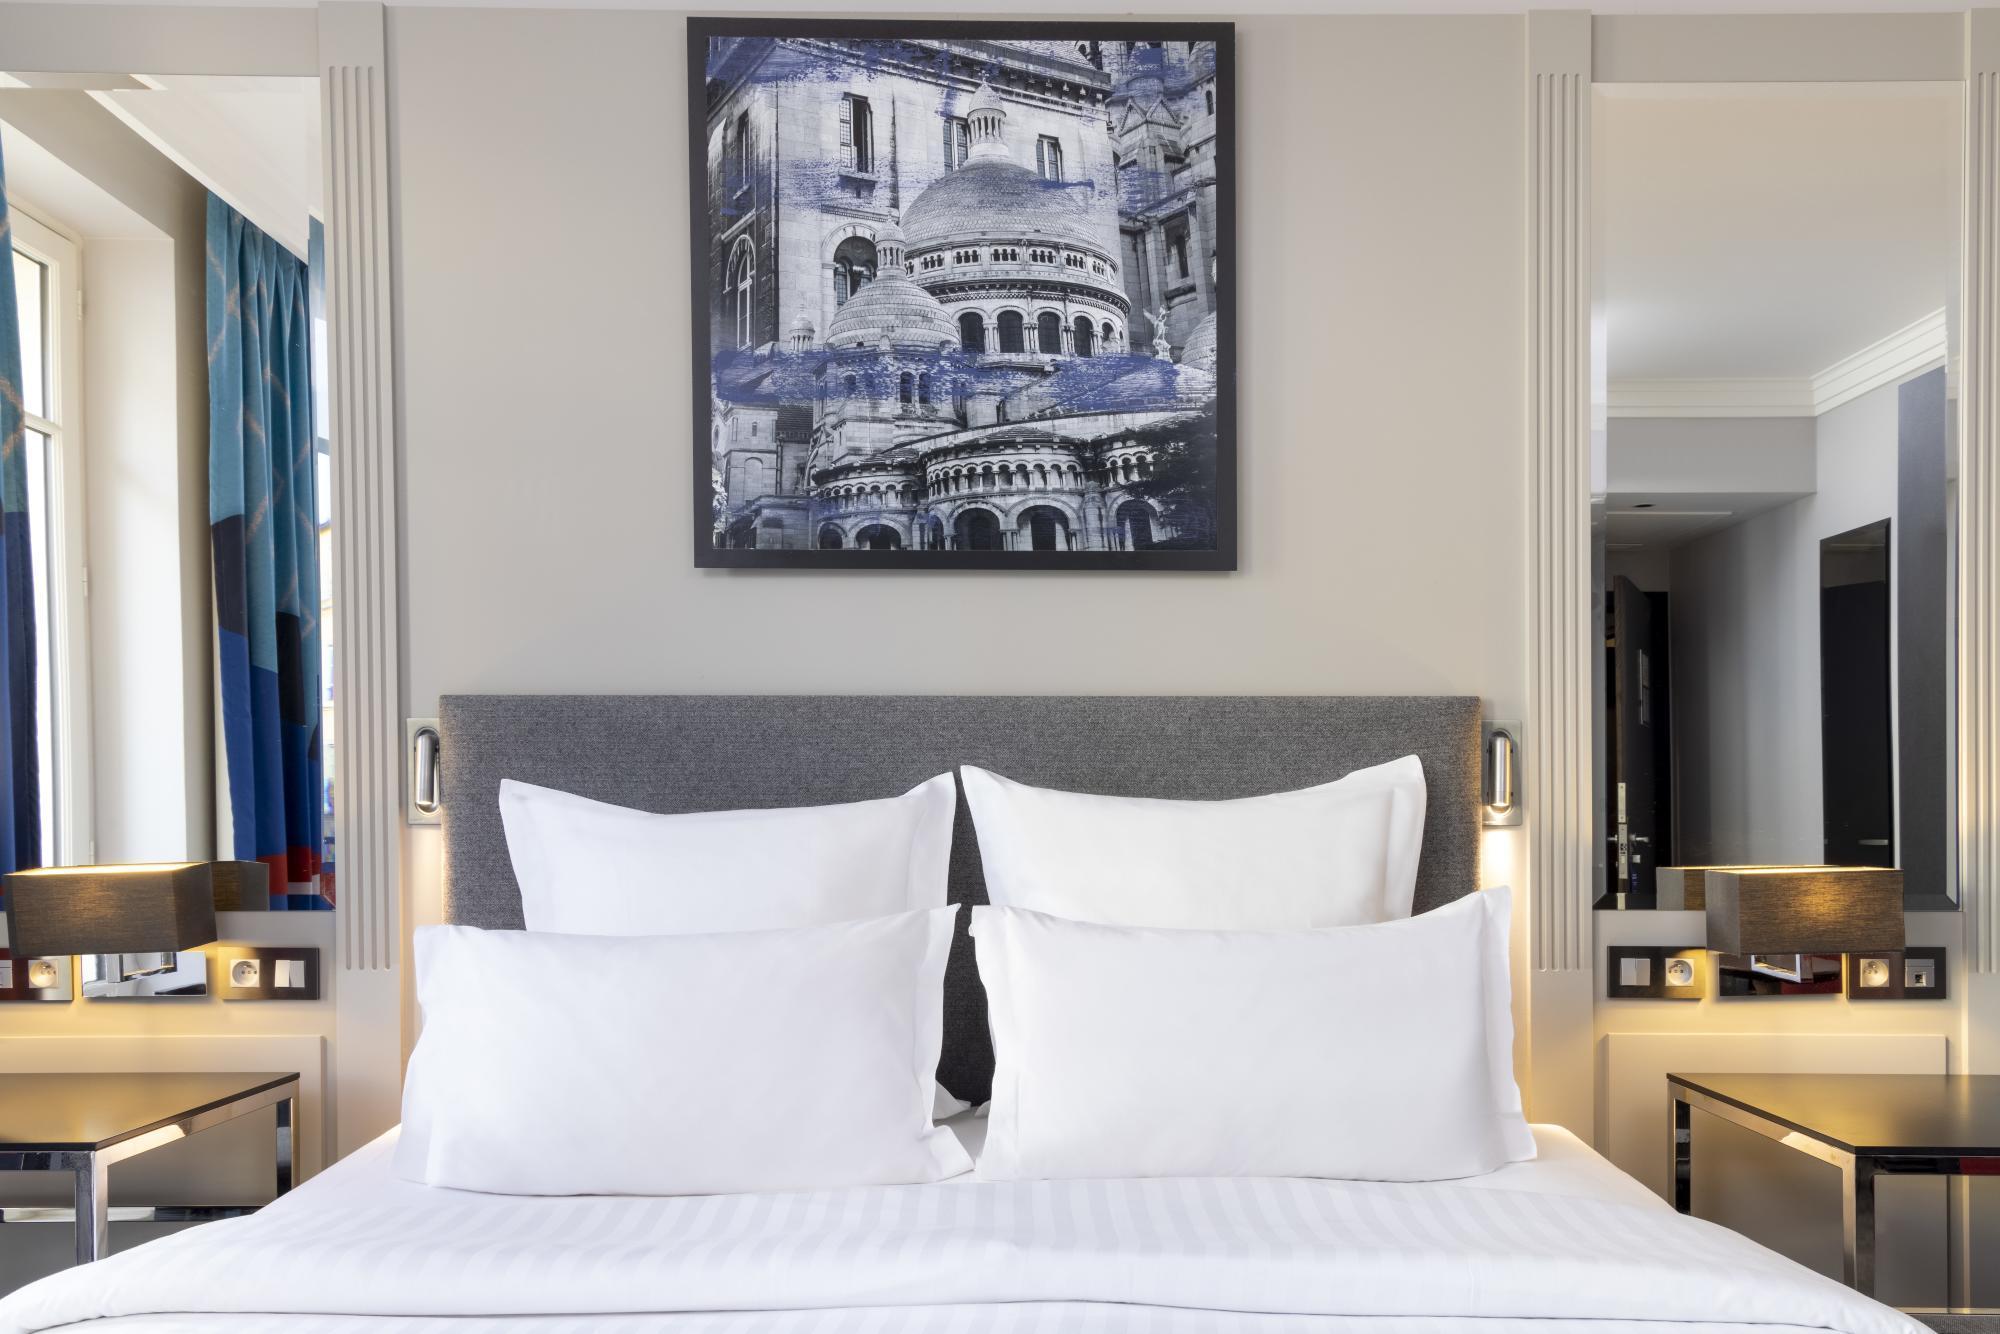 Hotel Les Matins de Paris Room Day Use